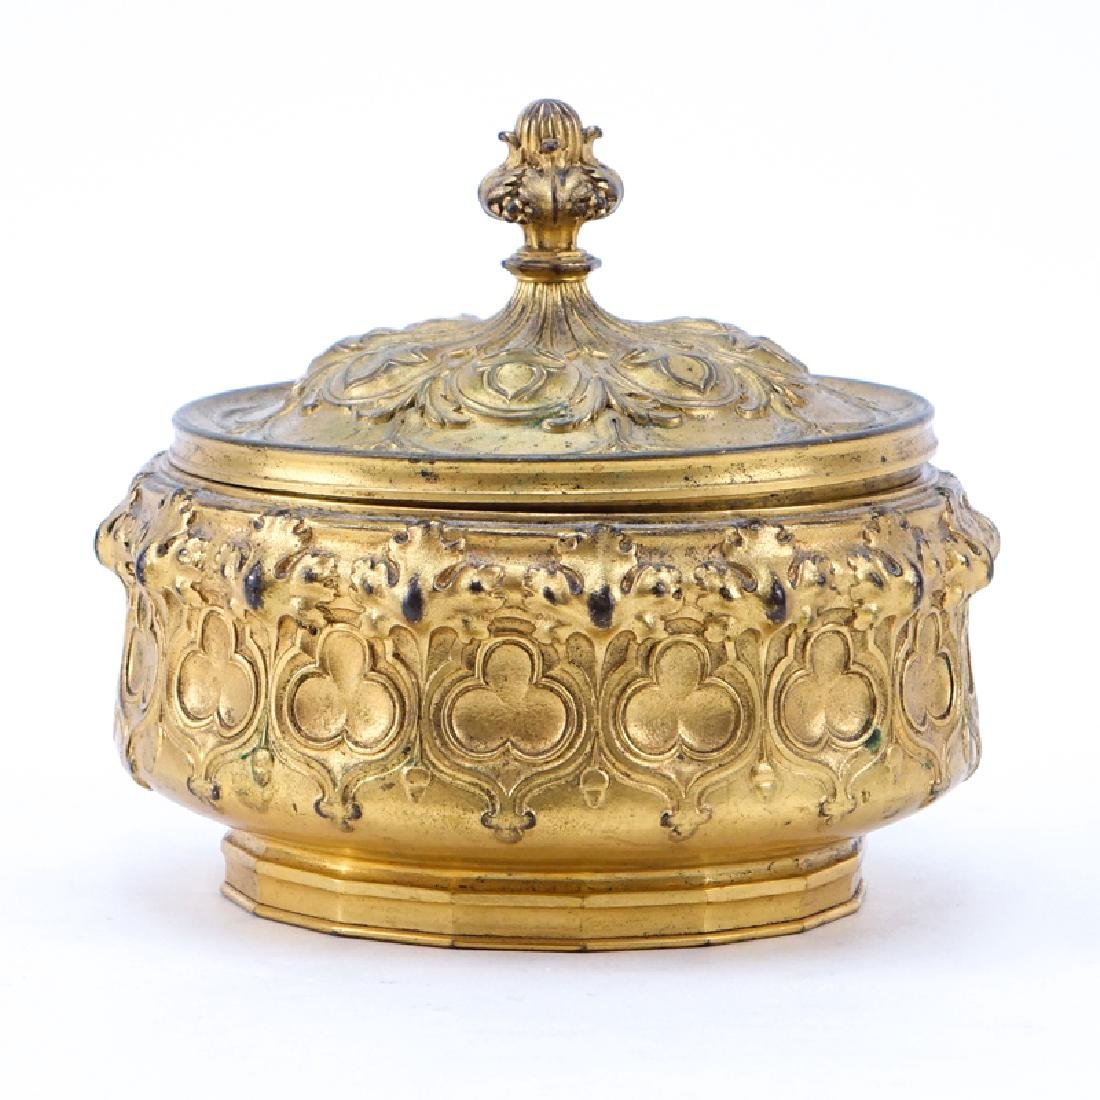 F. Barbedienne (19th Century) French Louis XVI Gilt